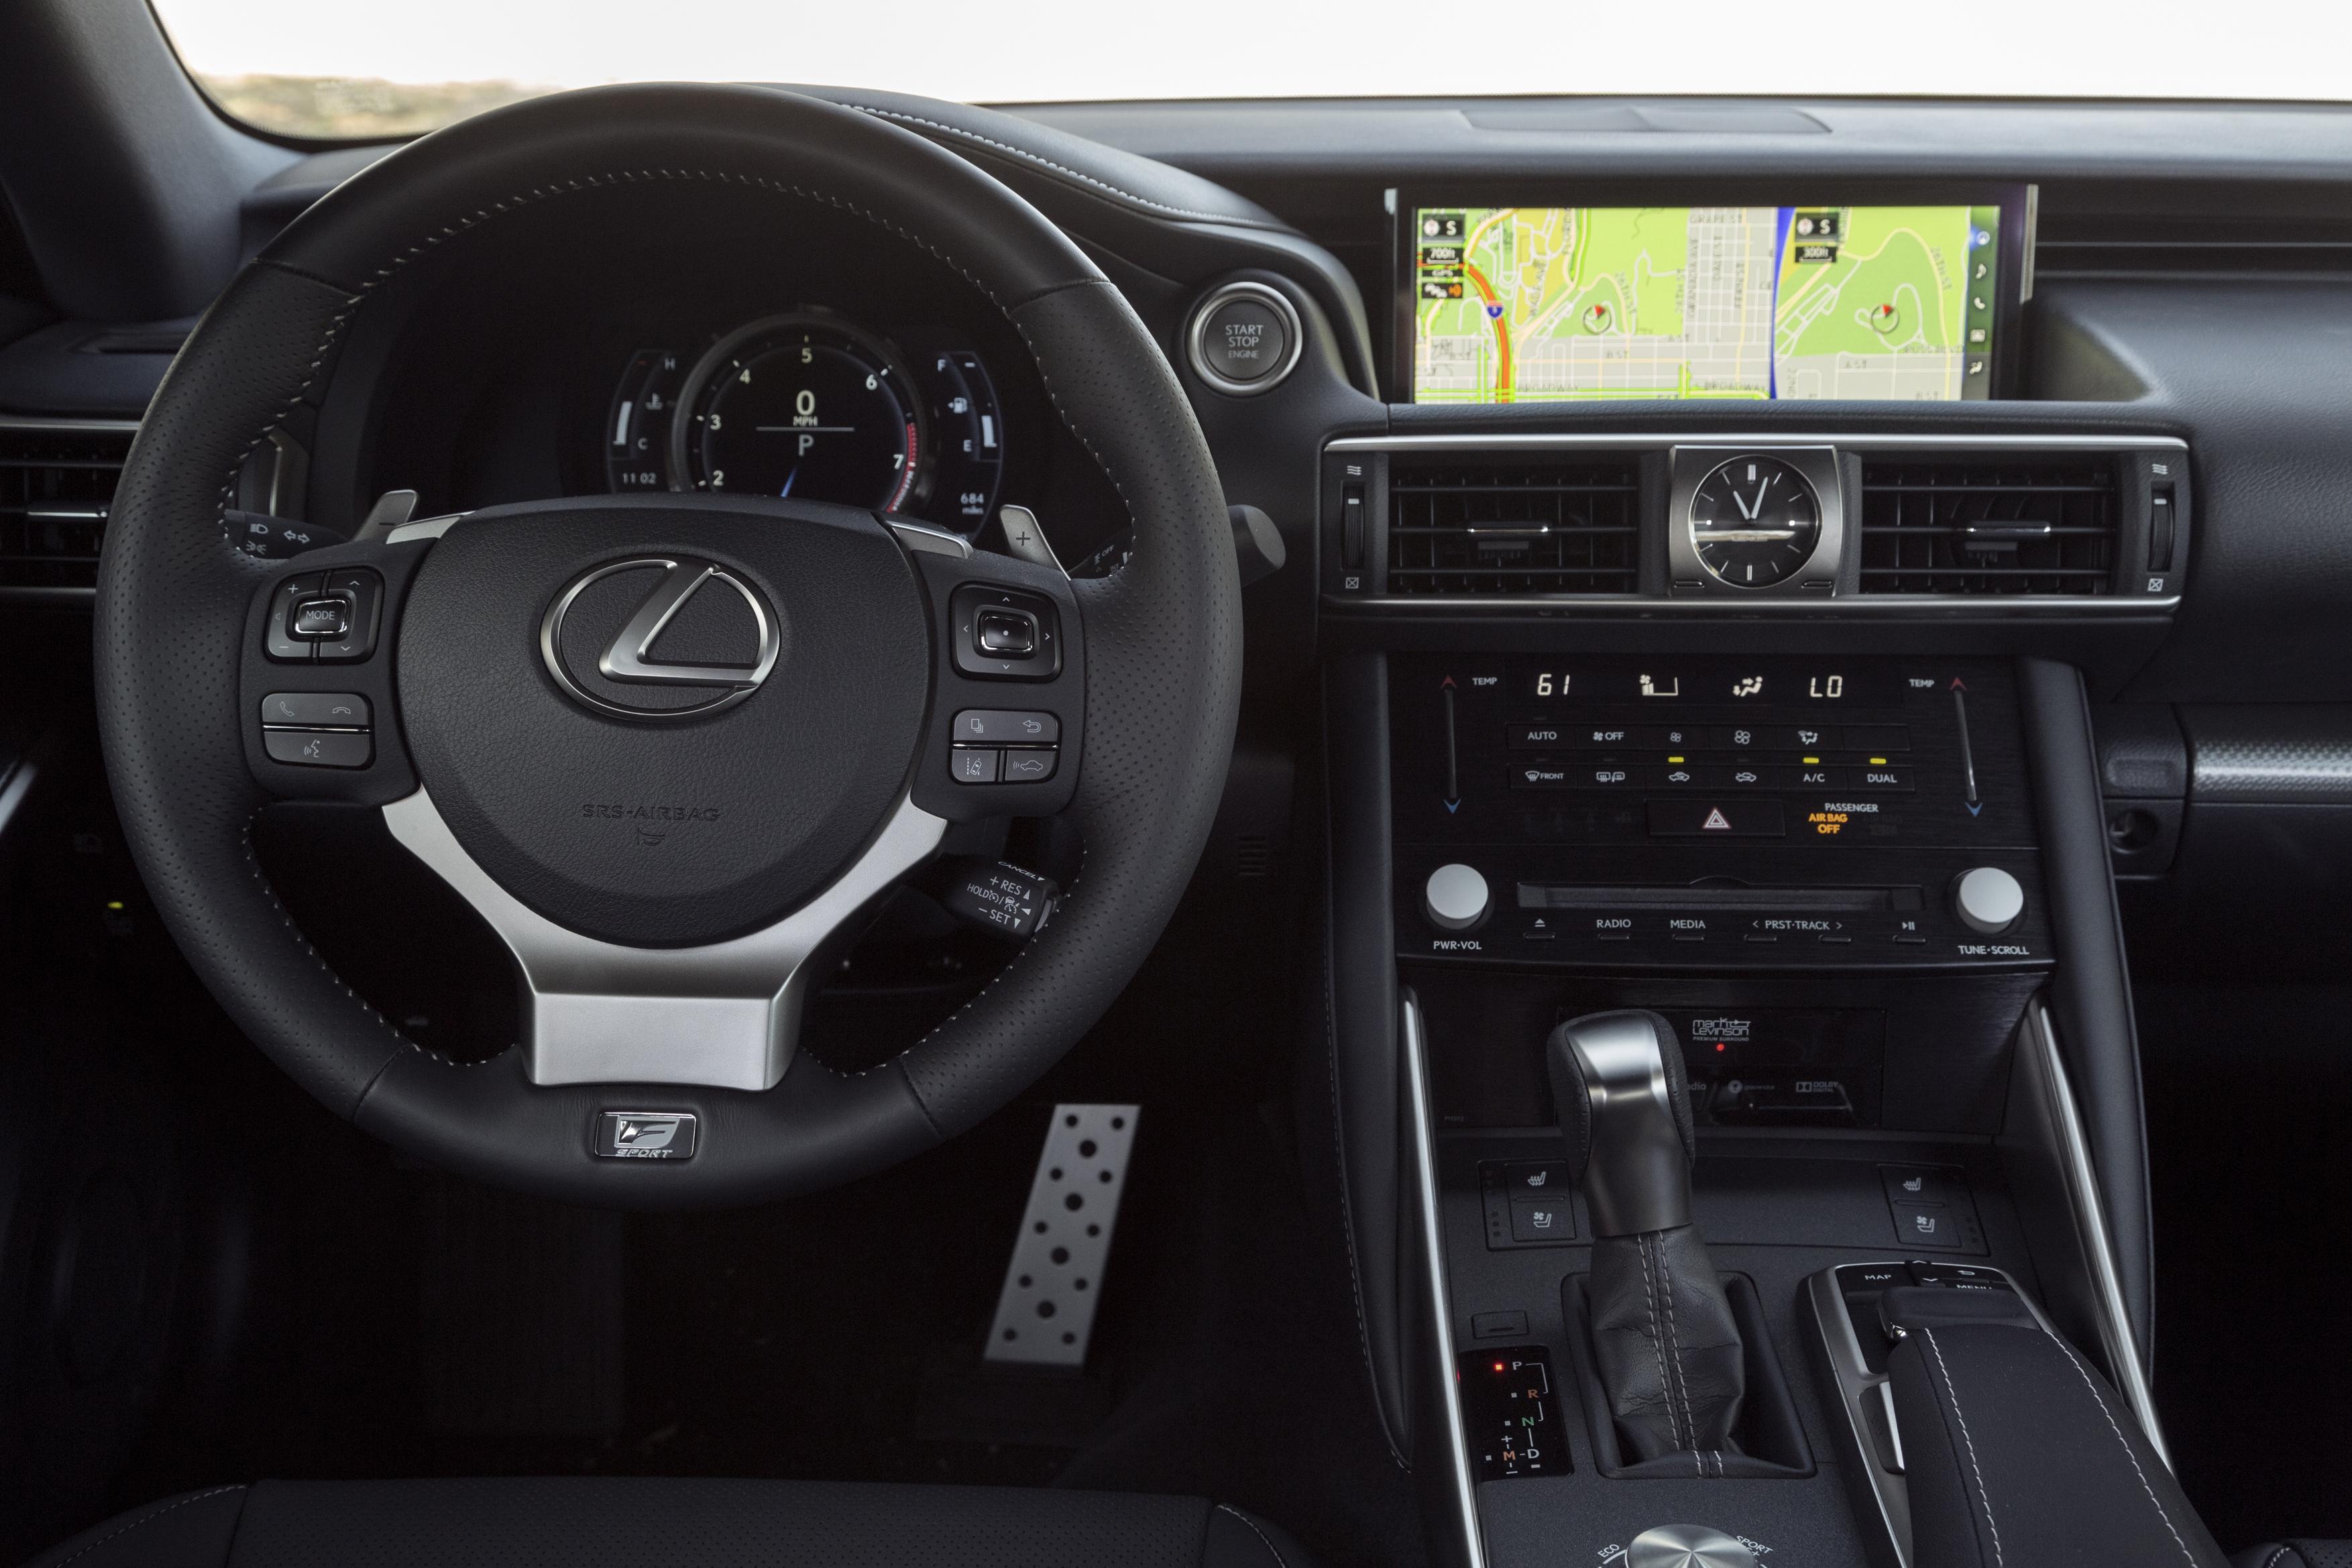 2017_Lexus_IS_350_F_SPORT_011_FEDA5D525CD599A5D8B66CBE8F89991E4917A14B